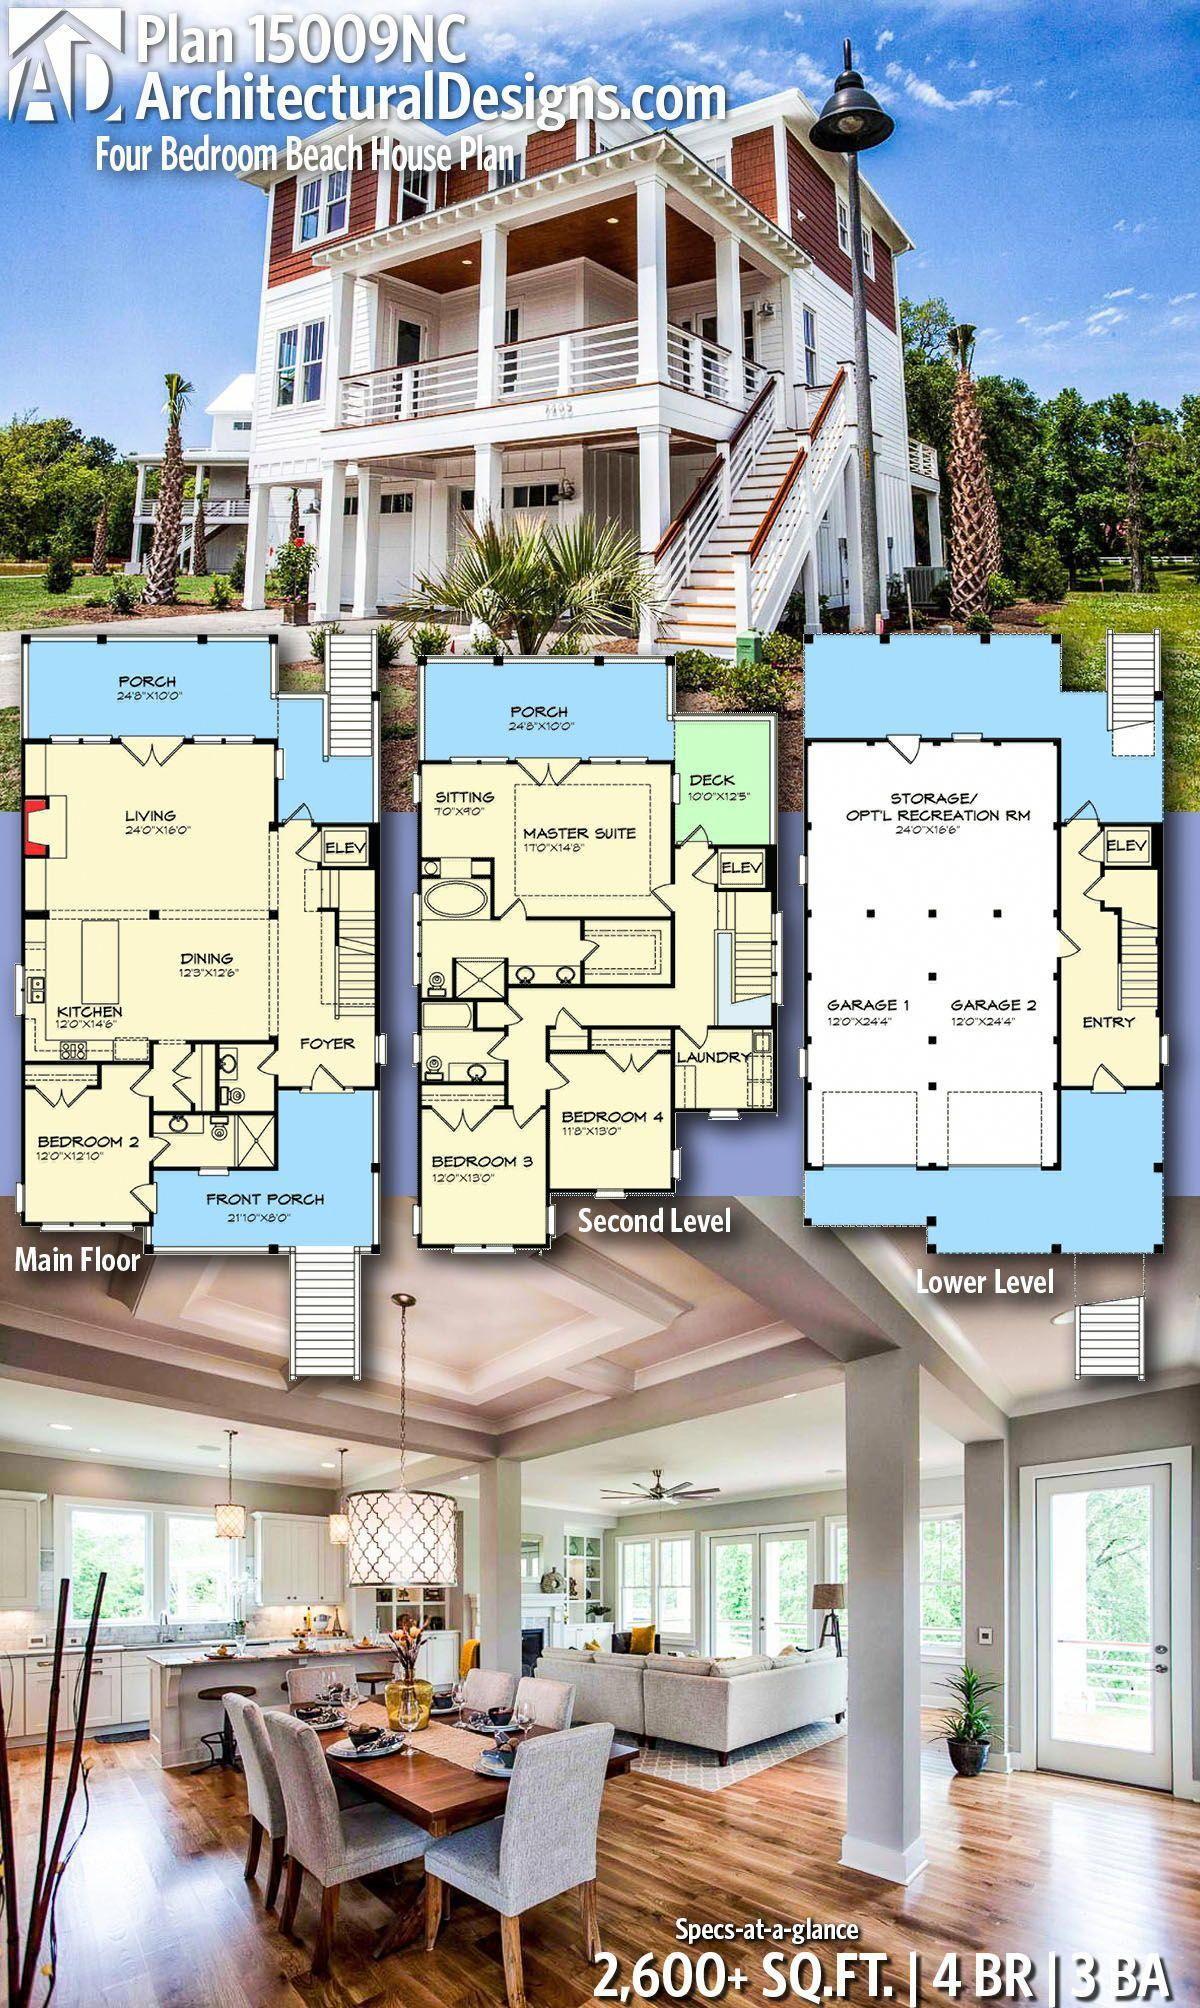 77 Premium Luxury Large Rustic Bedroom Design Ideas Beach House Floor Plans Beach House Plan Coastal House Plans